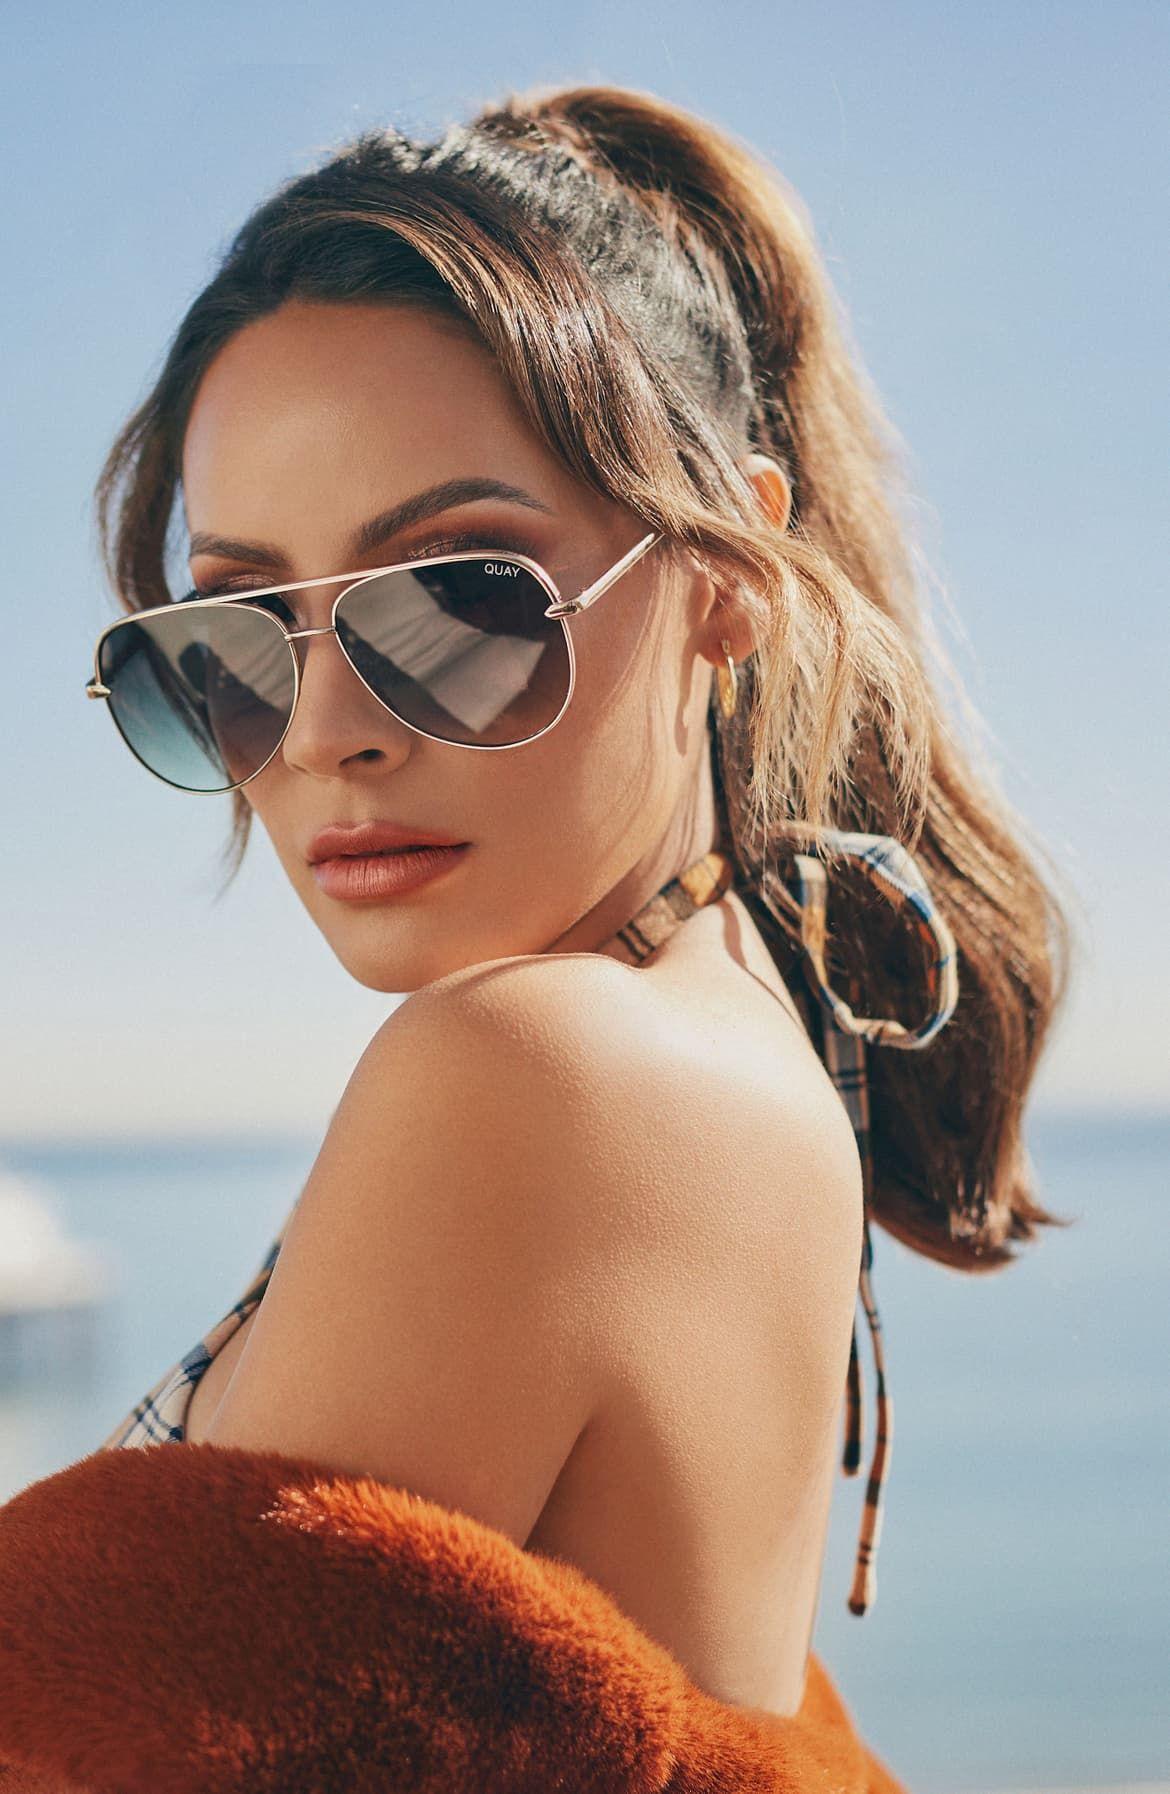 Hottest | Sunglasses women, Beautiful, Women